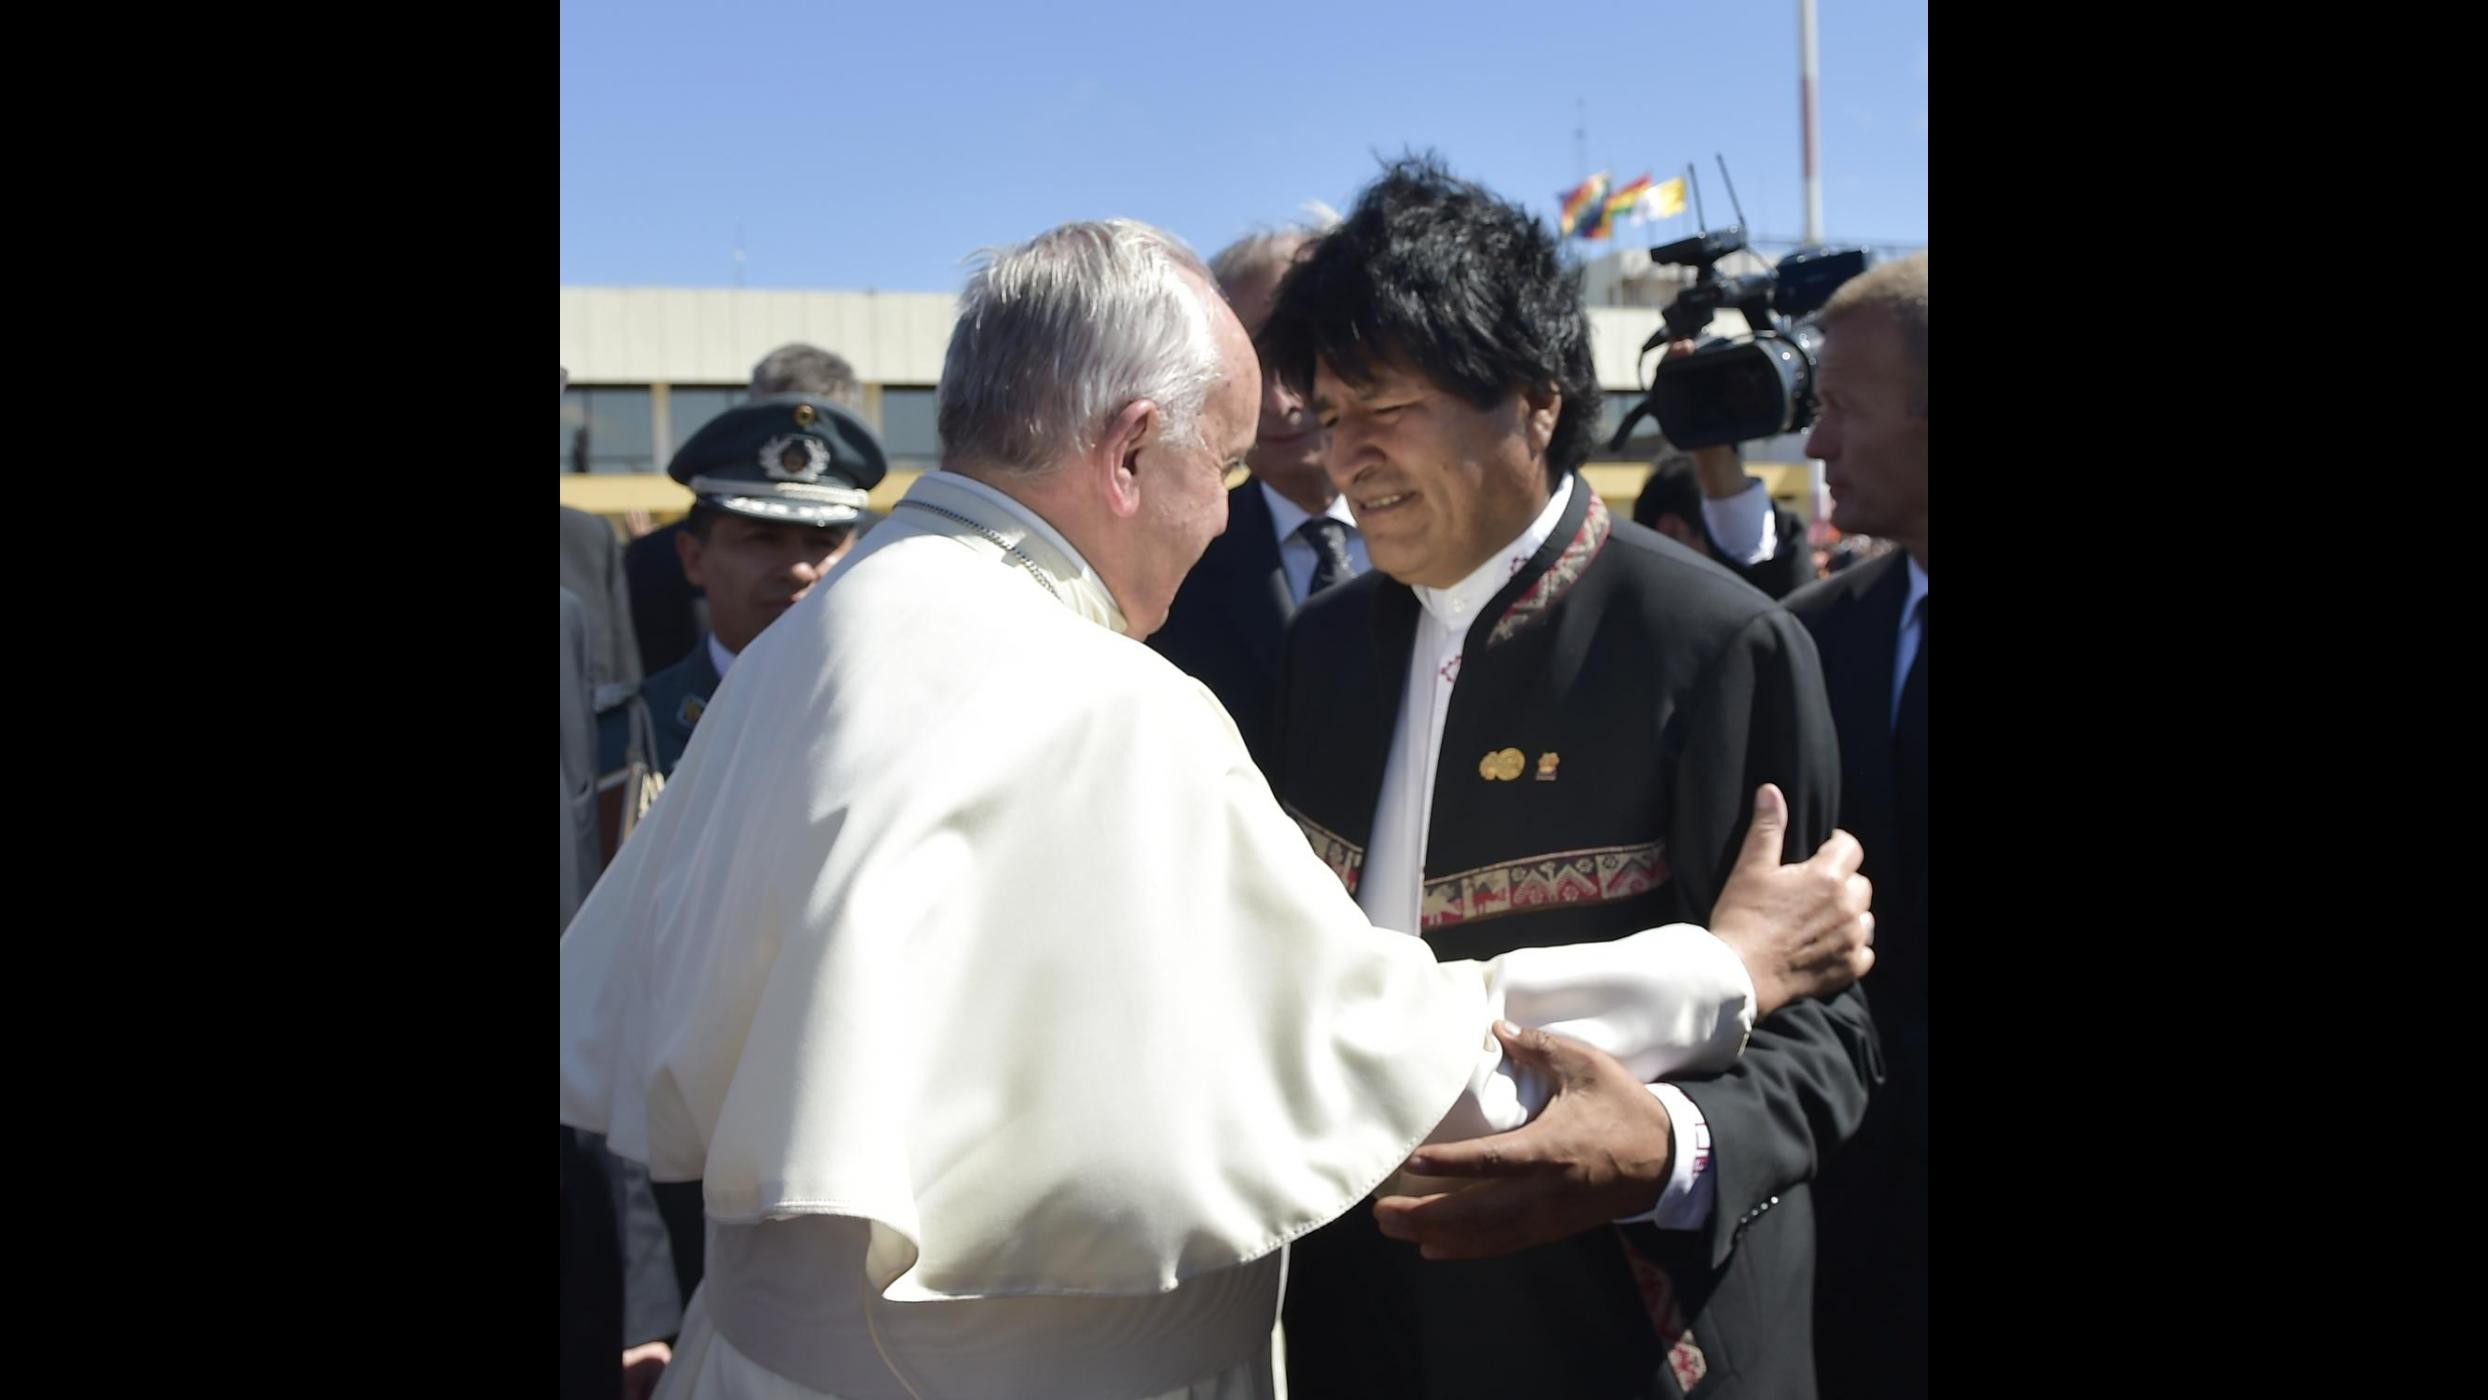 Papa all'Angelus: America Latina ha grandi potenzialità ma gravi problemi